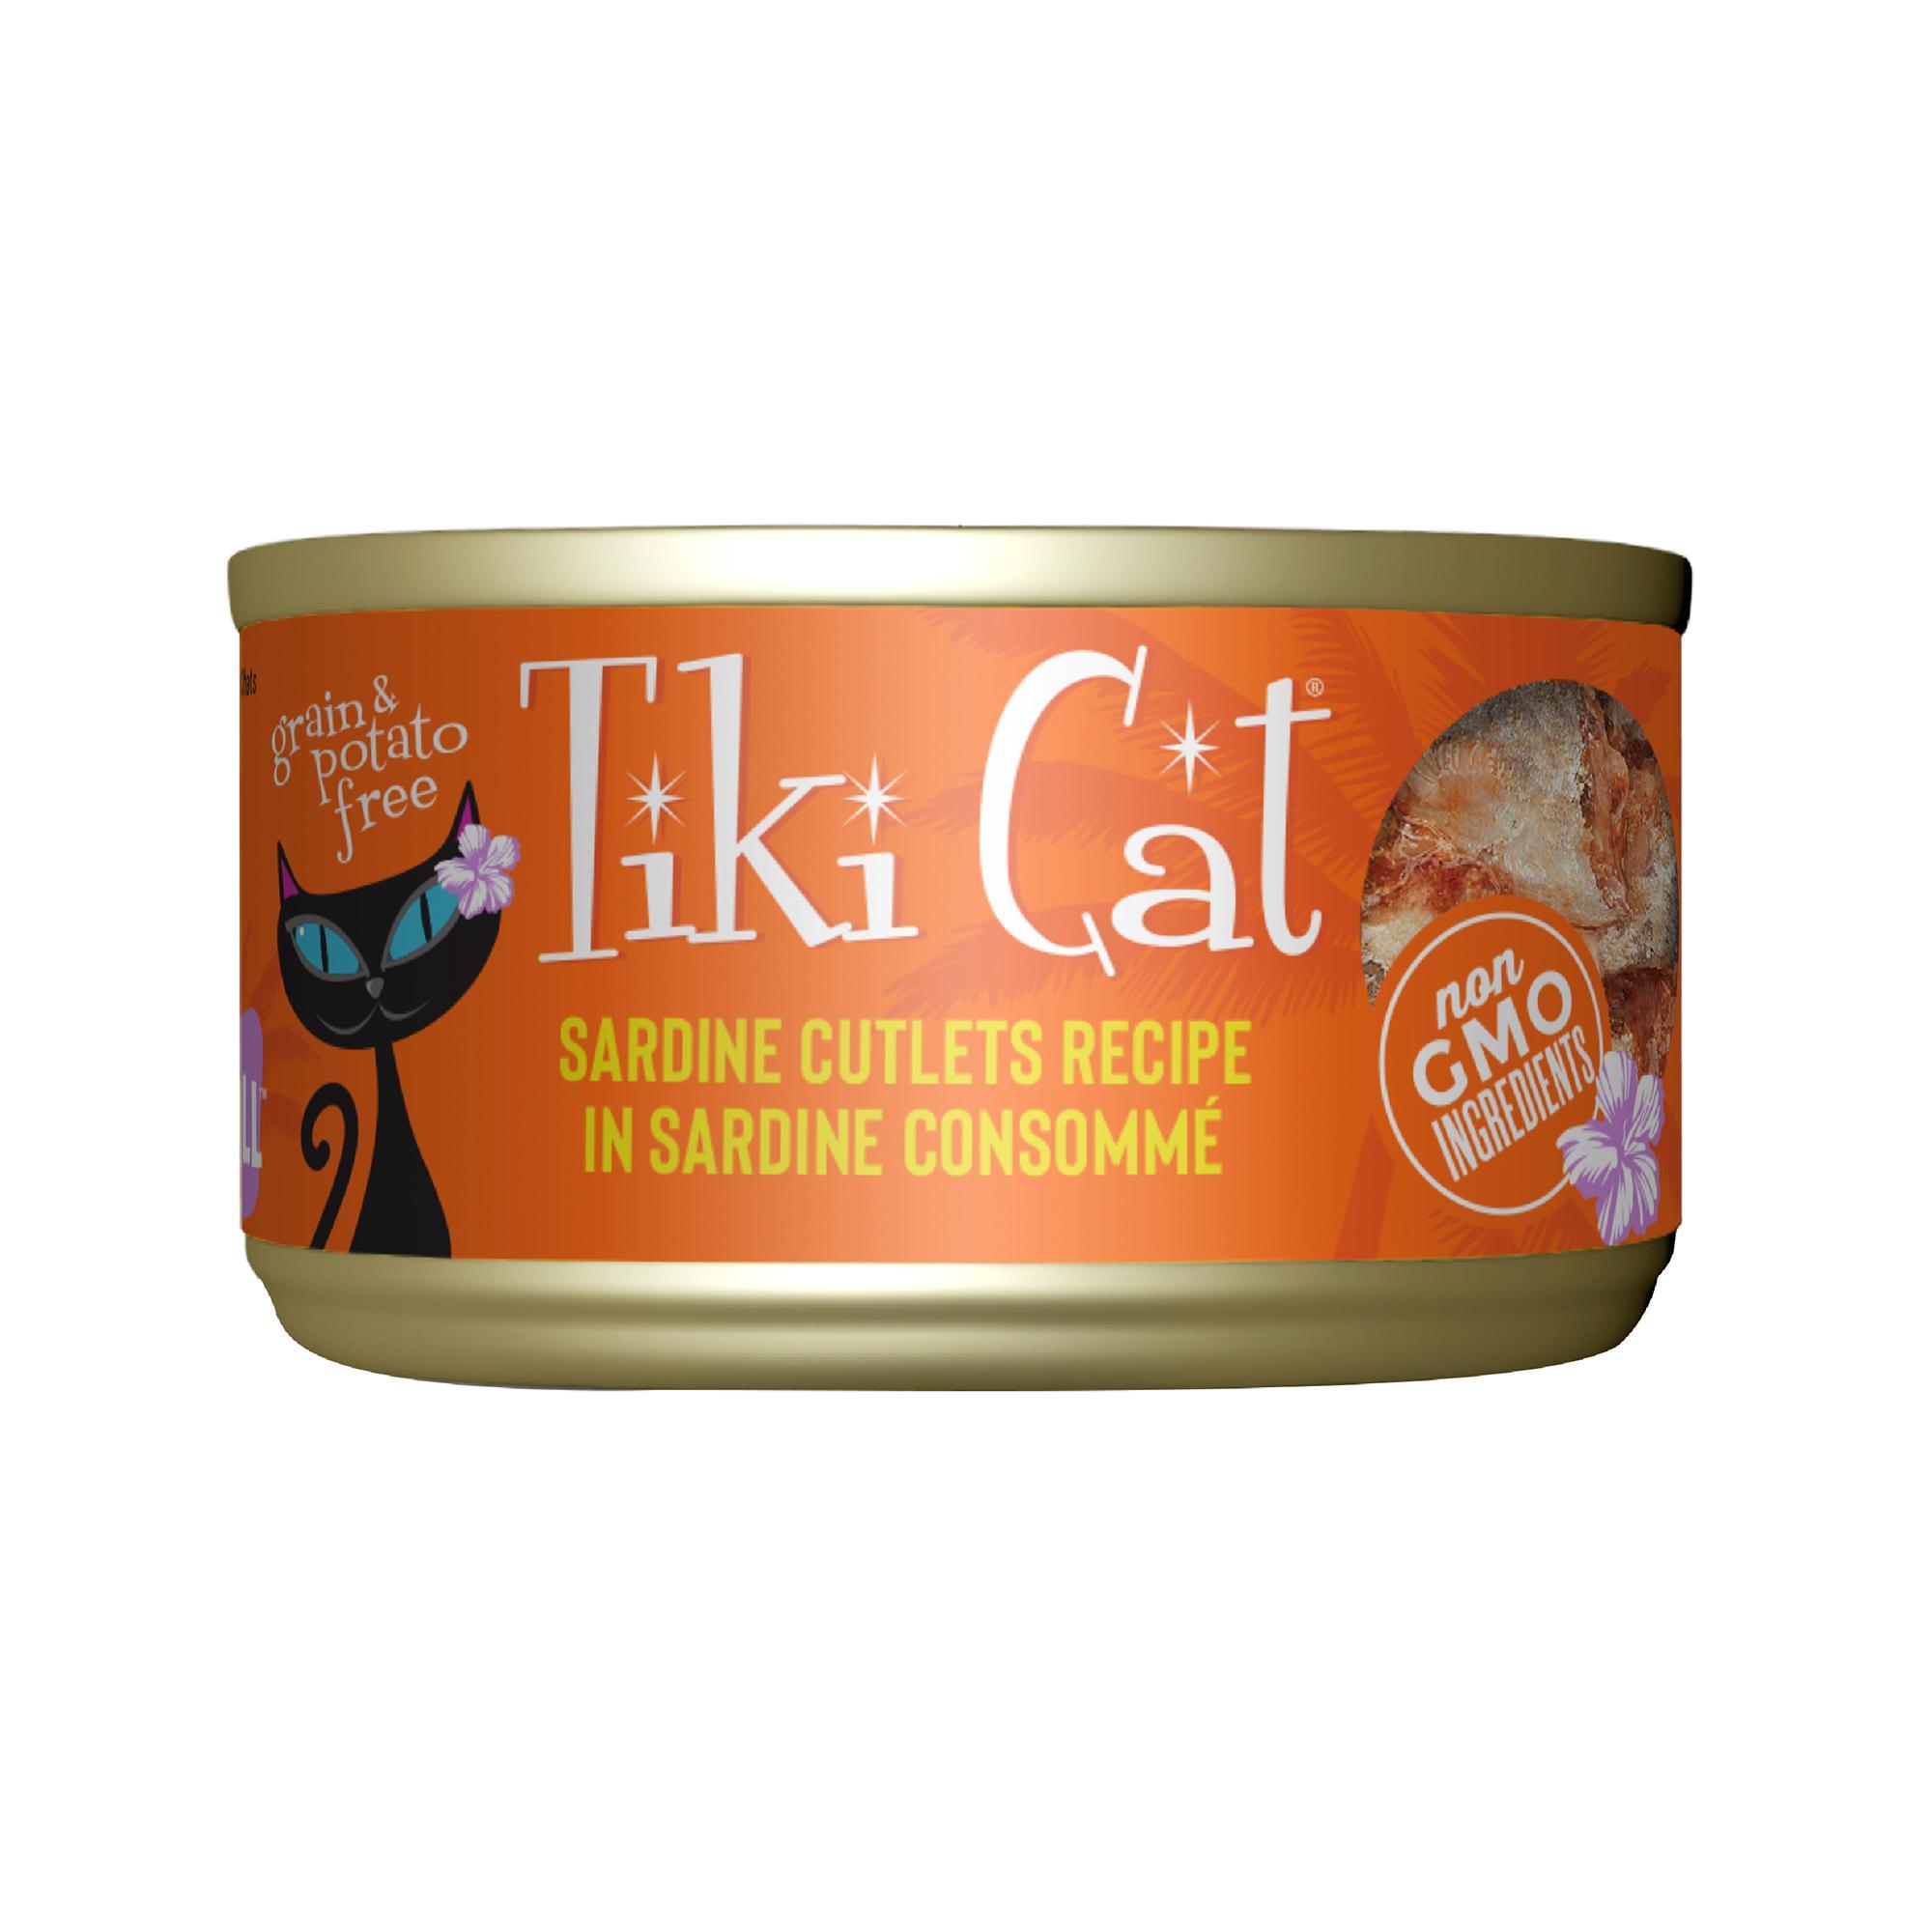 Tiki Cat Grill Sardine Cutlets Recipe in Sardine Consomme, 2.8-oz